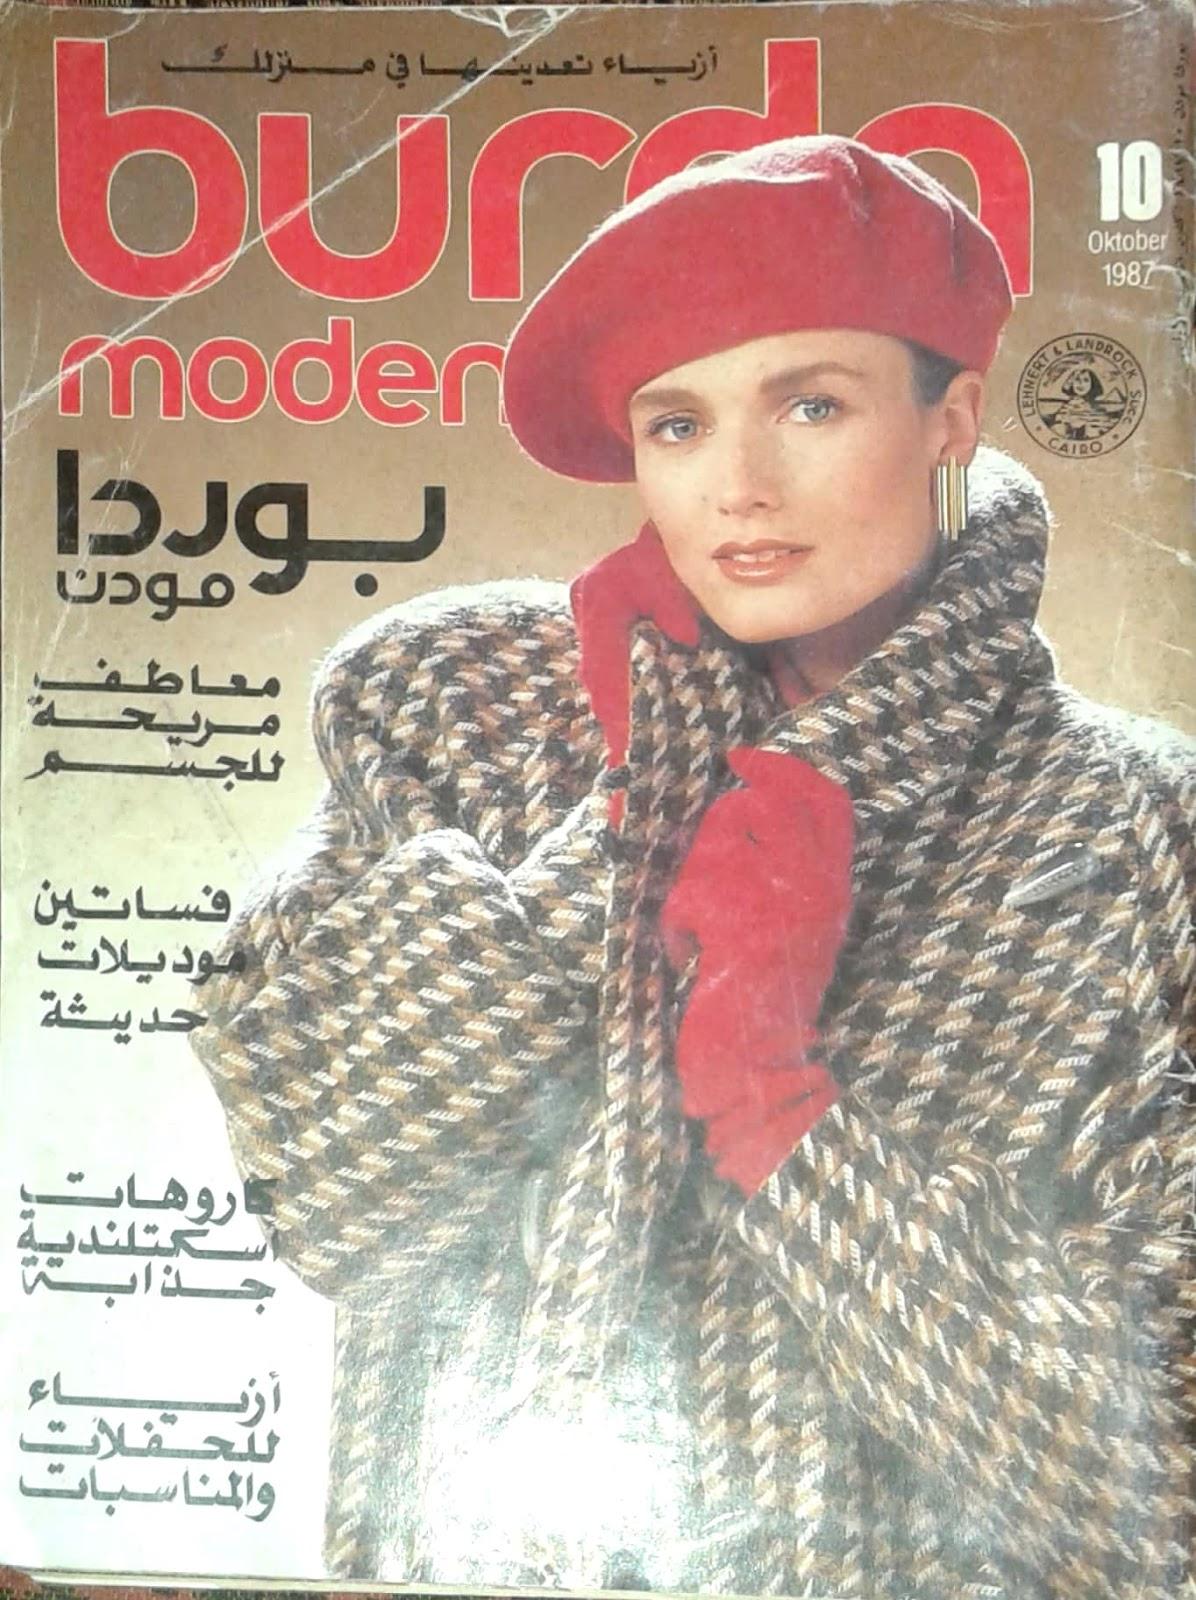 0d2e01a28b8b8 تحميل مجلة بوردا بالعربي اصدار شهر اكتوبر ~ تعليم خياطة-Learn sewing